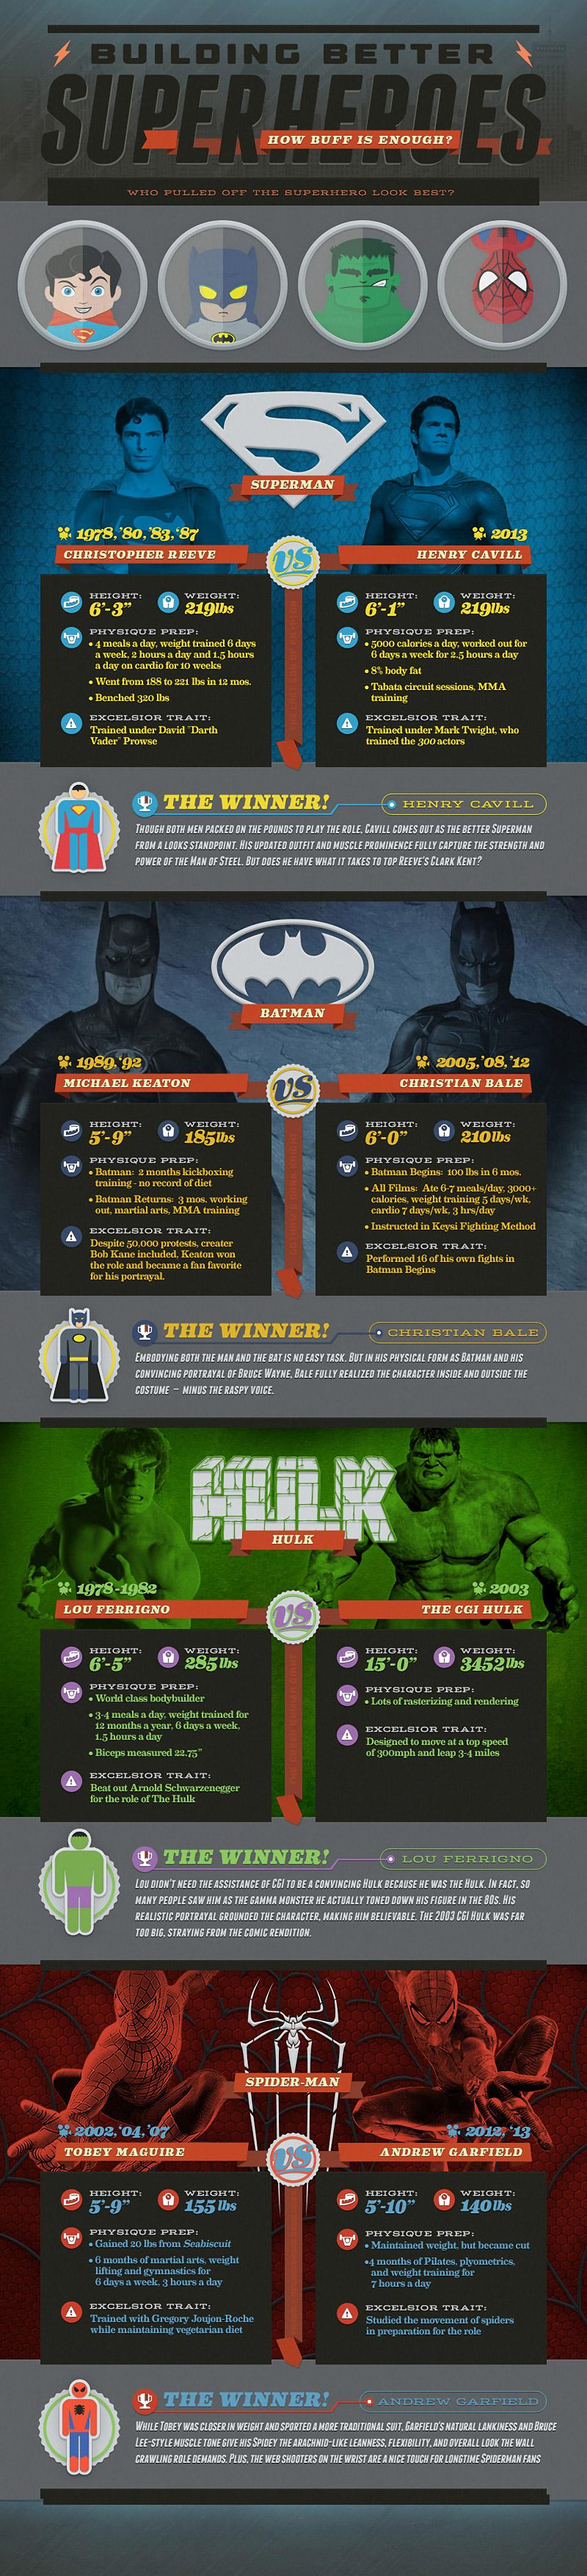 Better Buff Superhero Physiques?